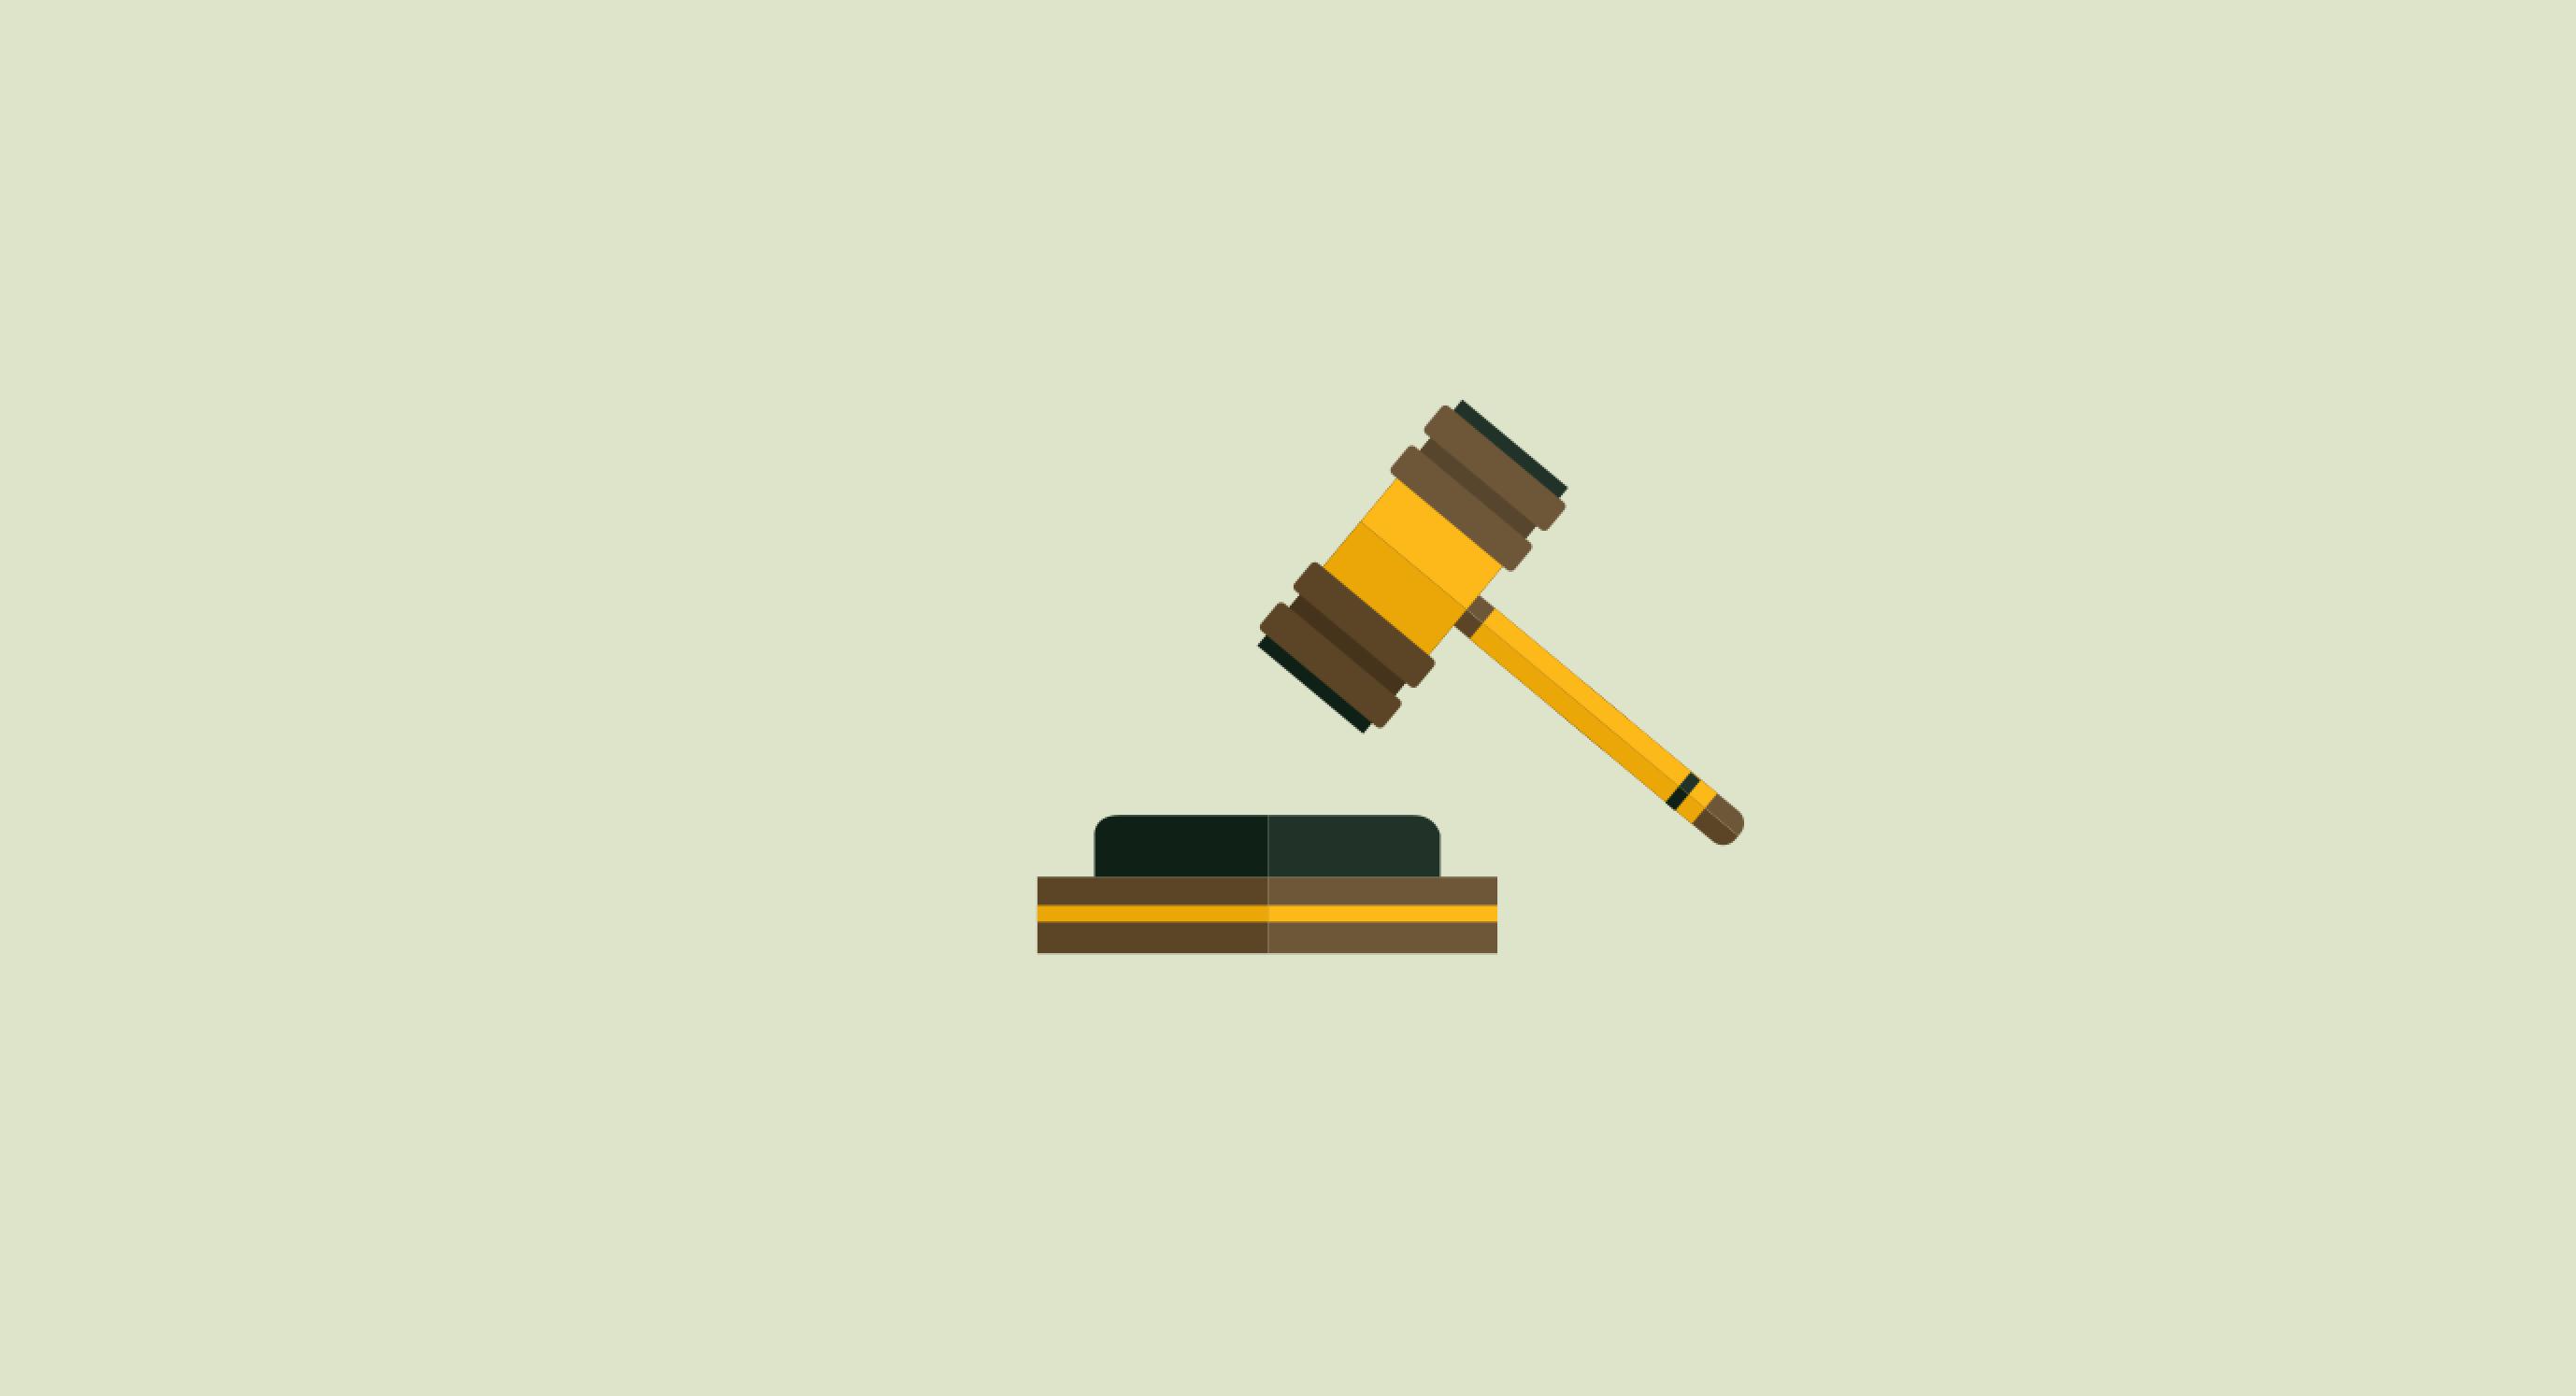 legal-law-judge-lawyer-suing-sue